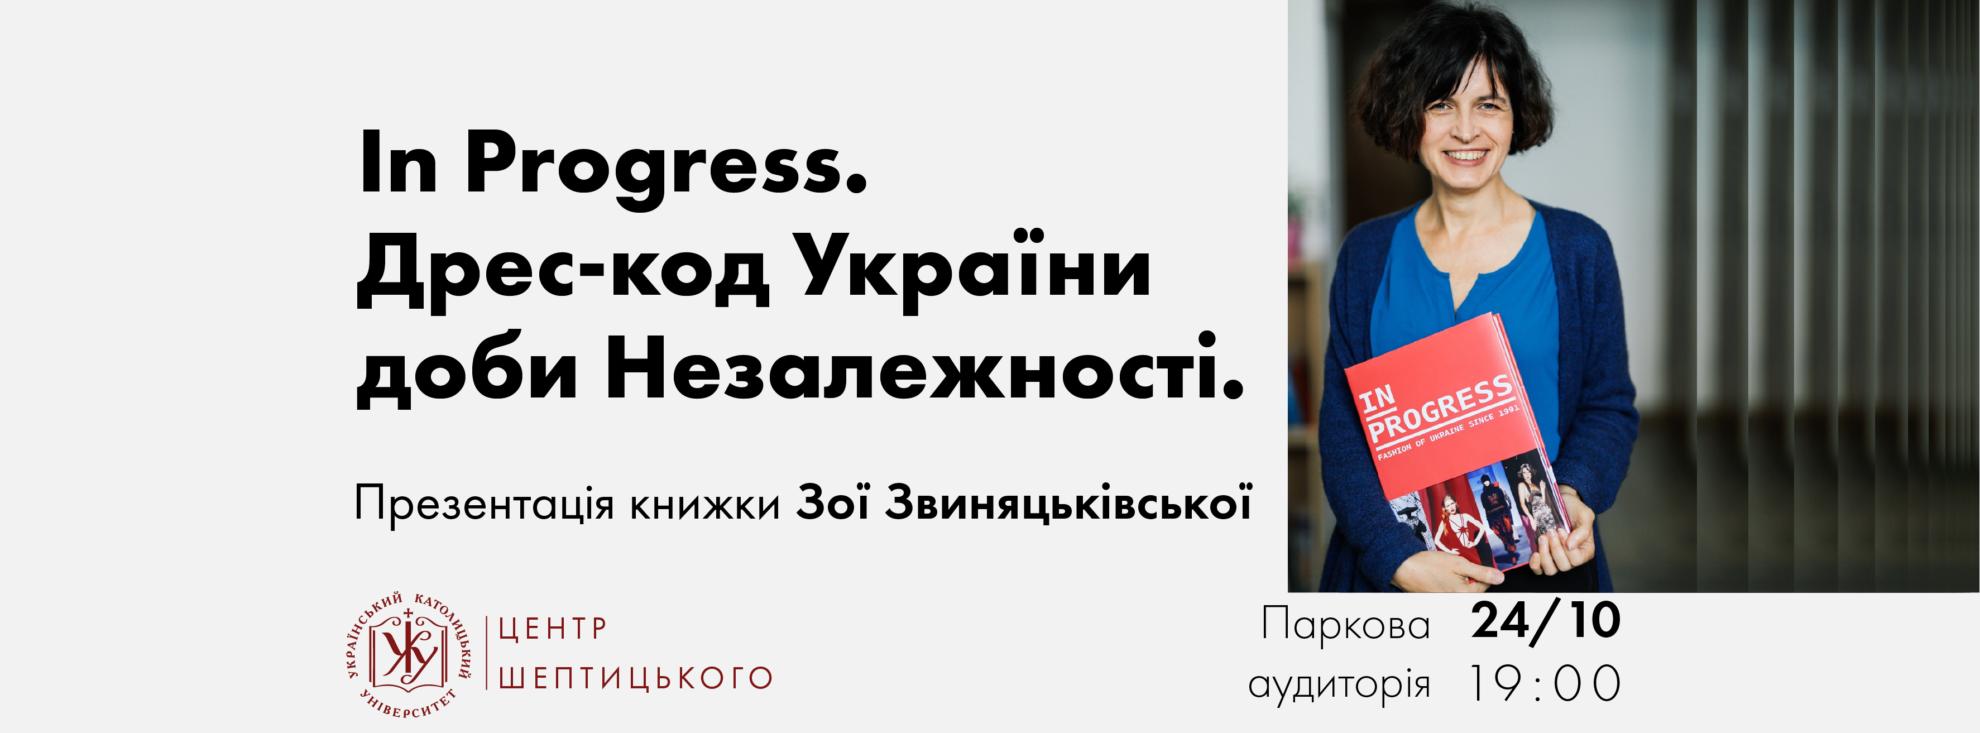 In Progress. Дрес-код України доби Незалежності